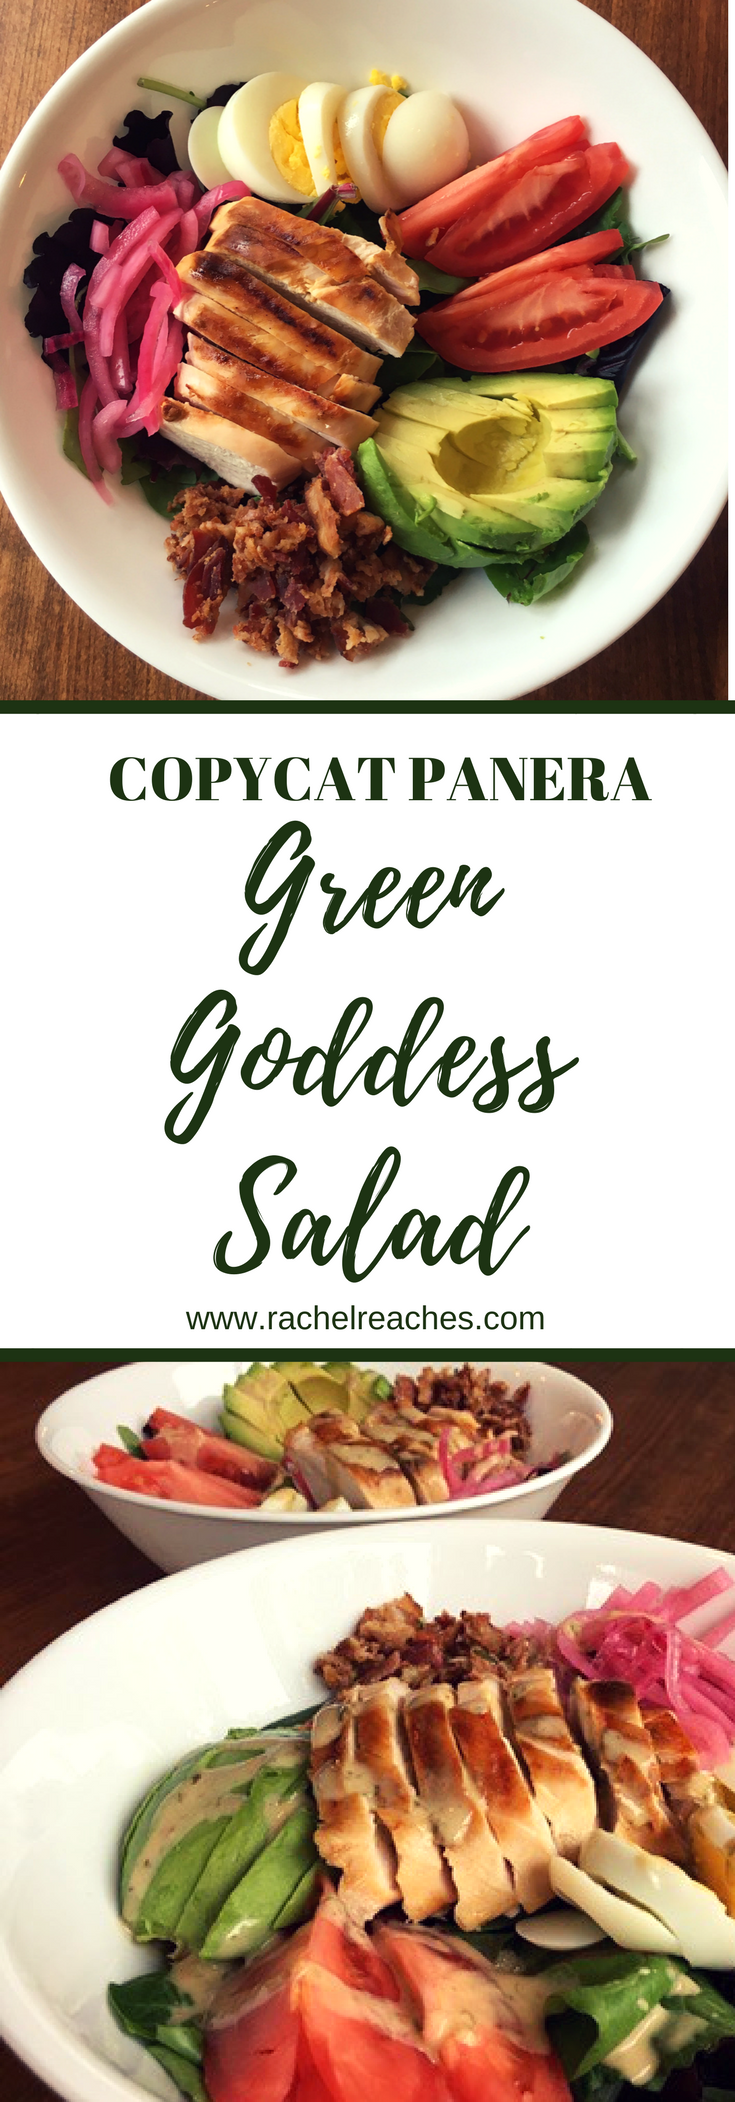 Copycat Panera Green Goddess Pinterest Pin - Healthy Recipes.png